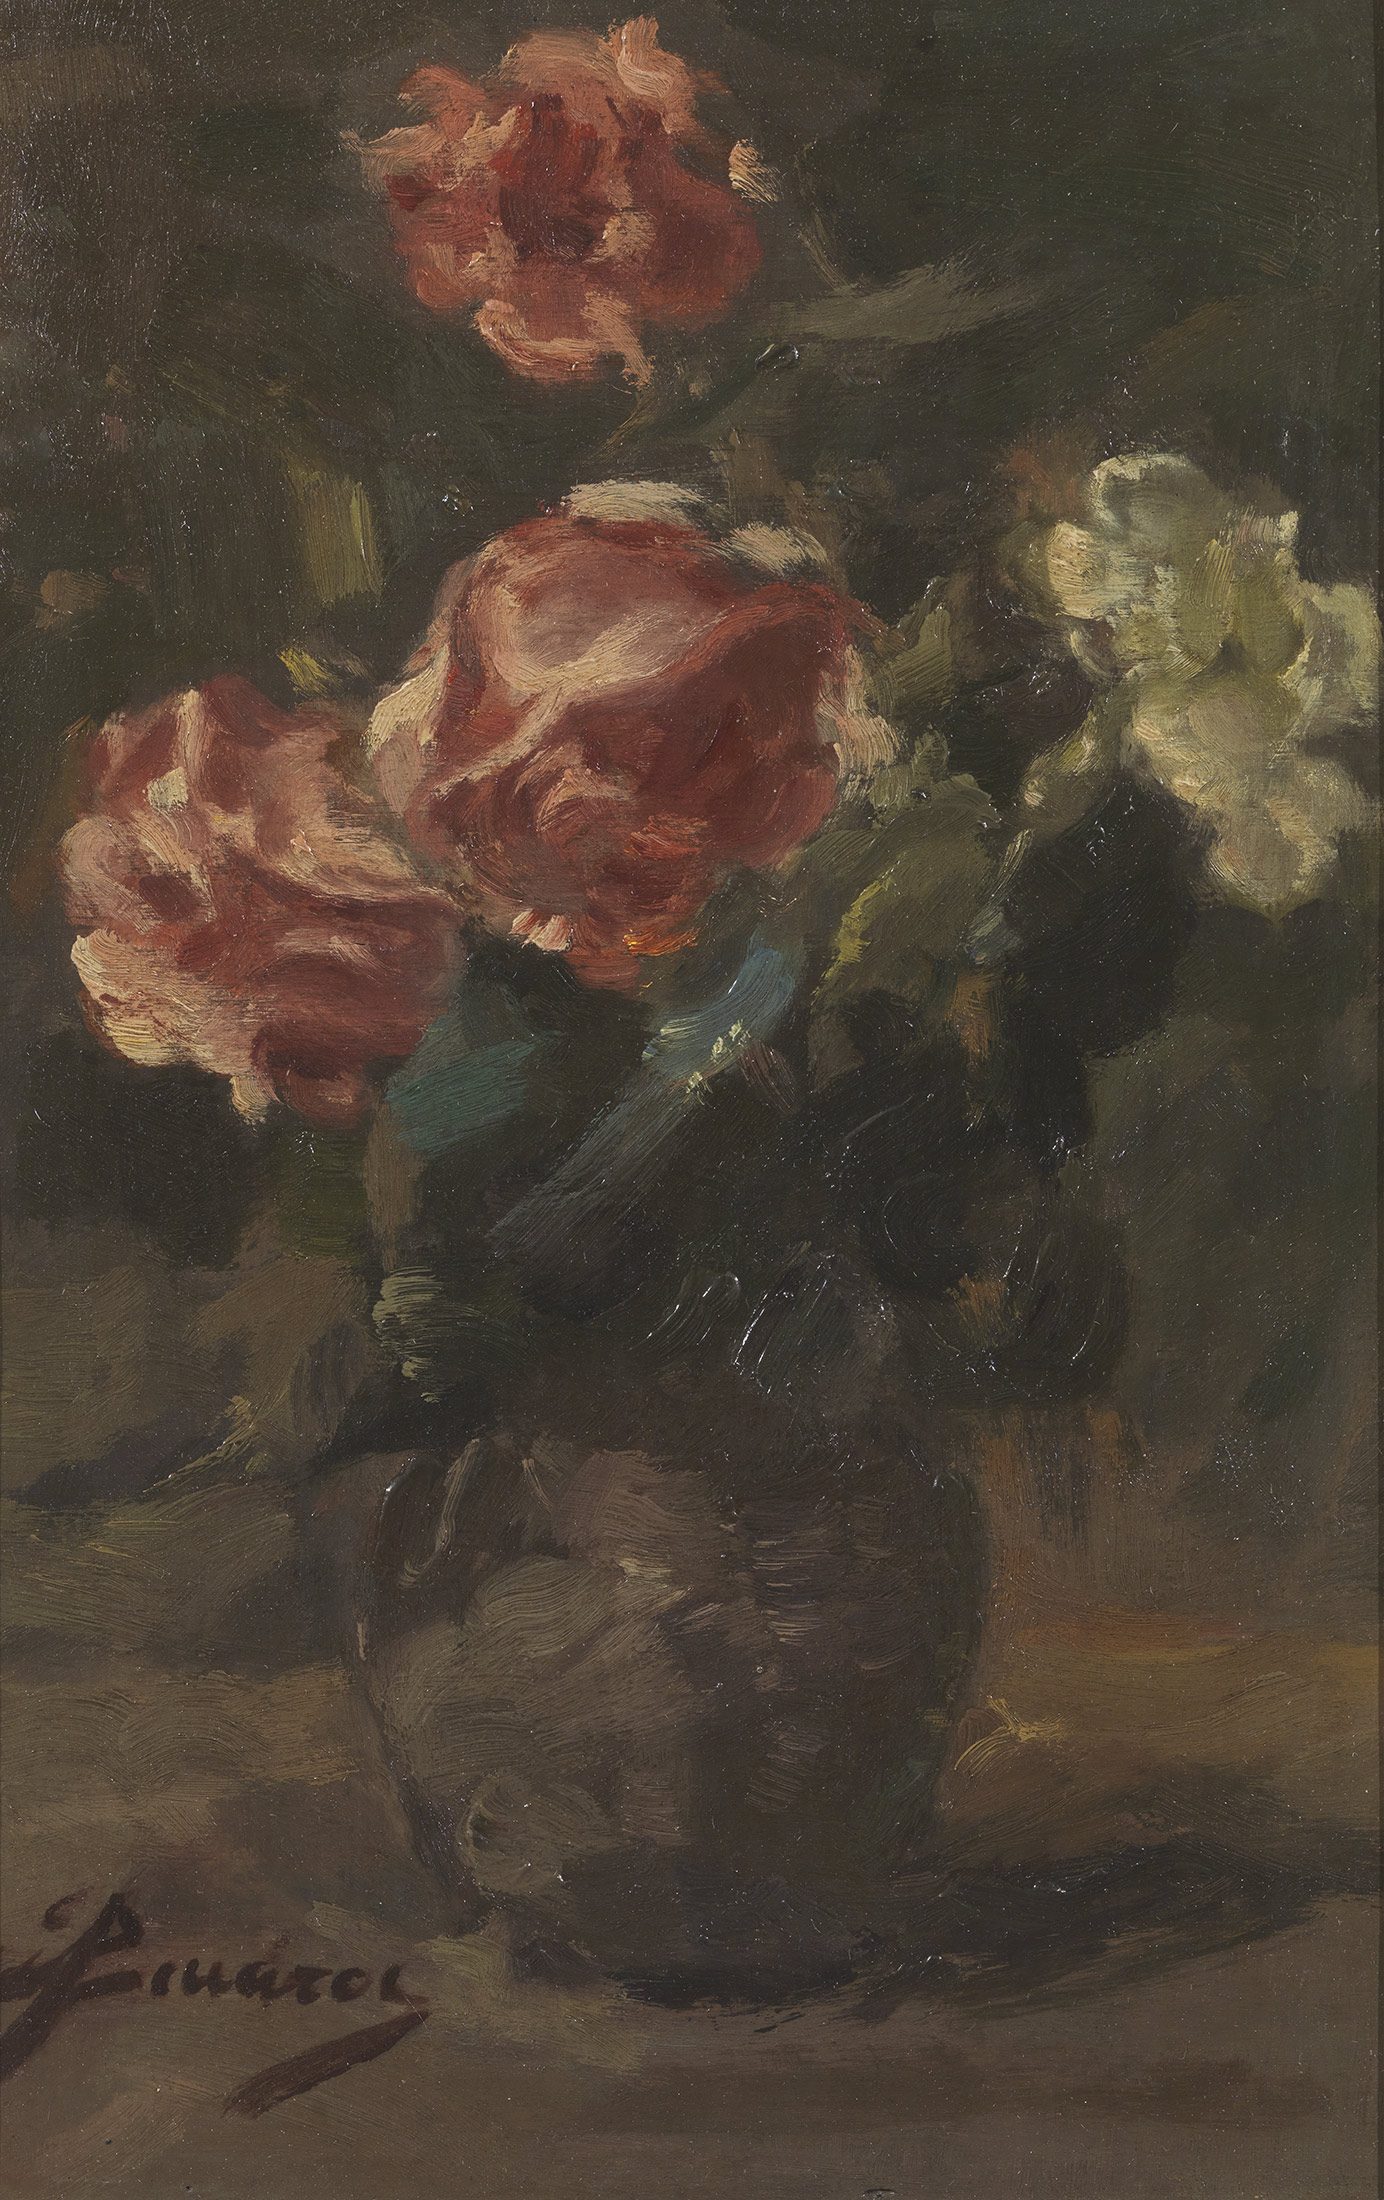 Spyridon Vicatos - Vase of flowers